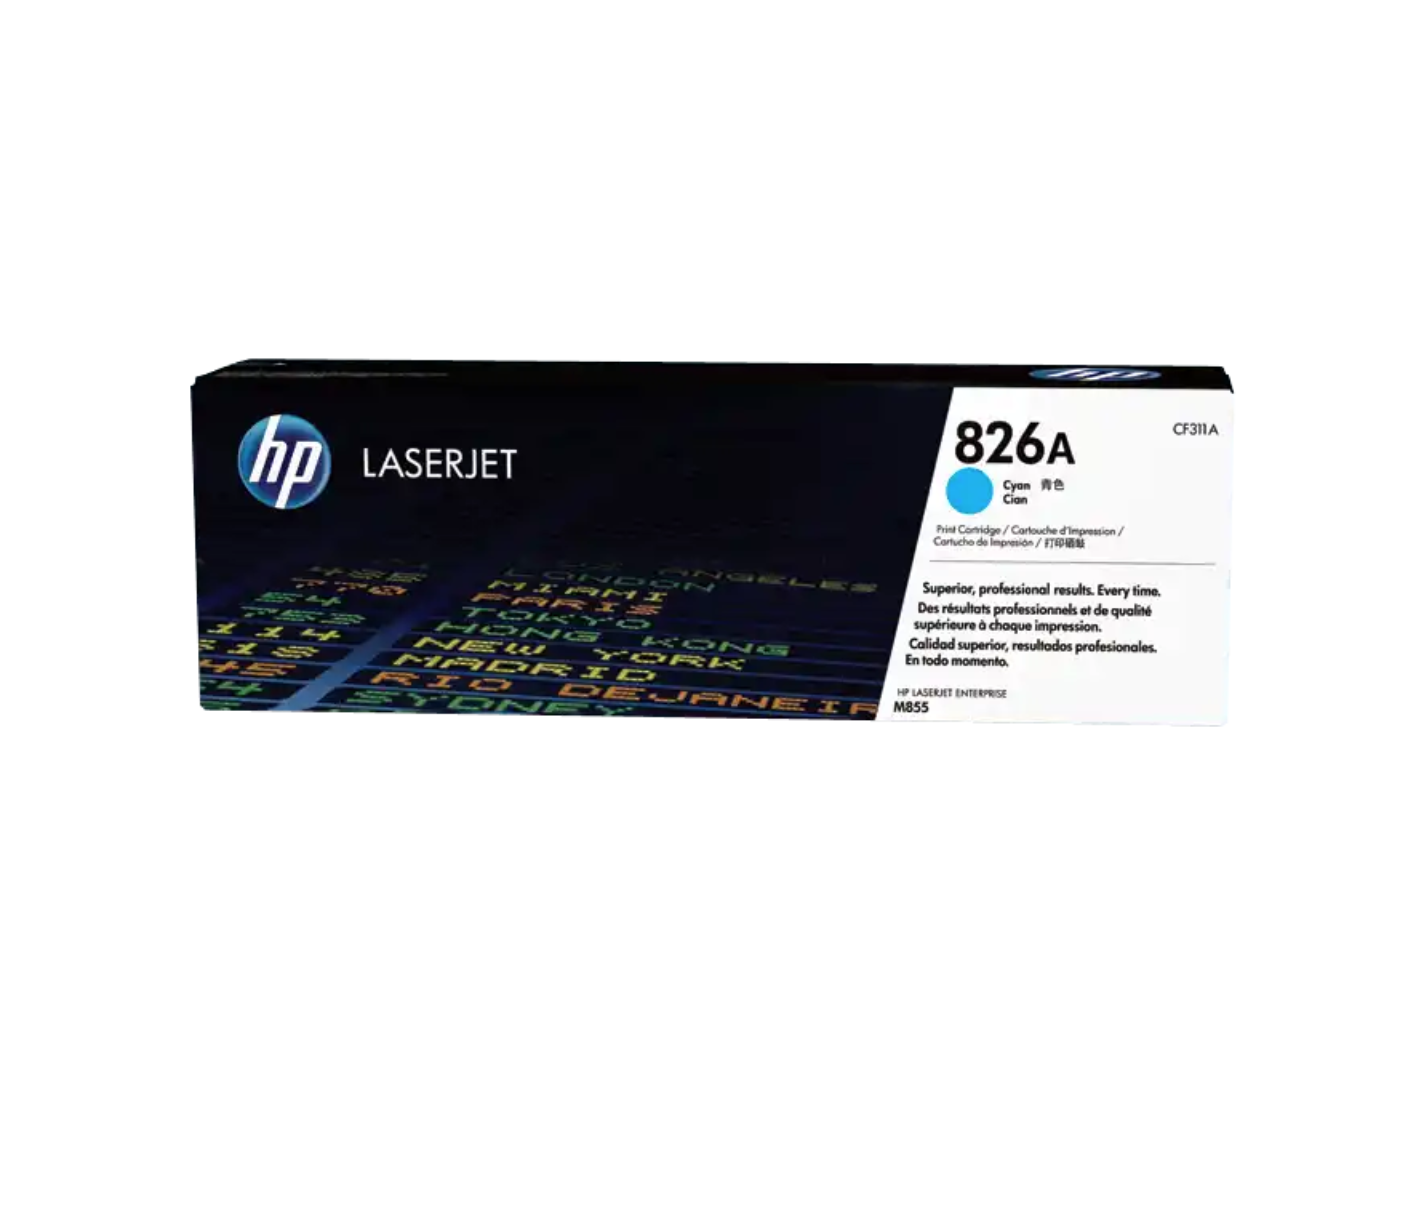 HP 826A 綻藍原廠 LaserJet 碳粉 CF311A